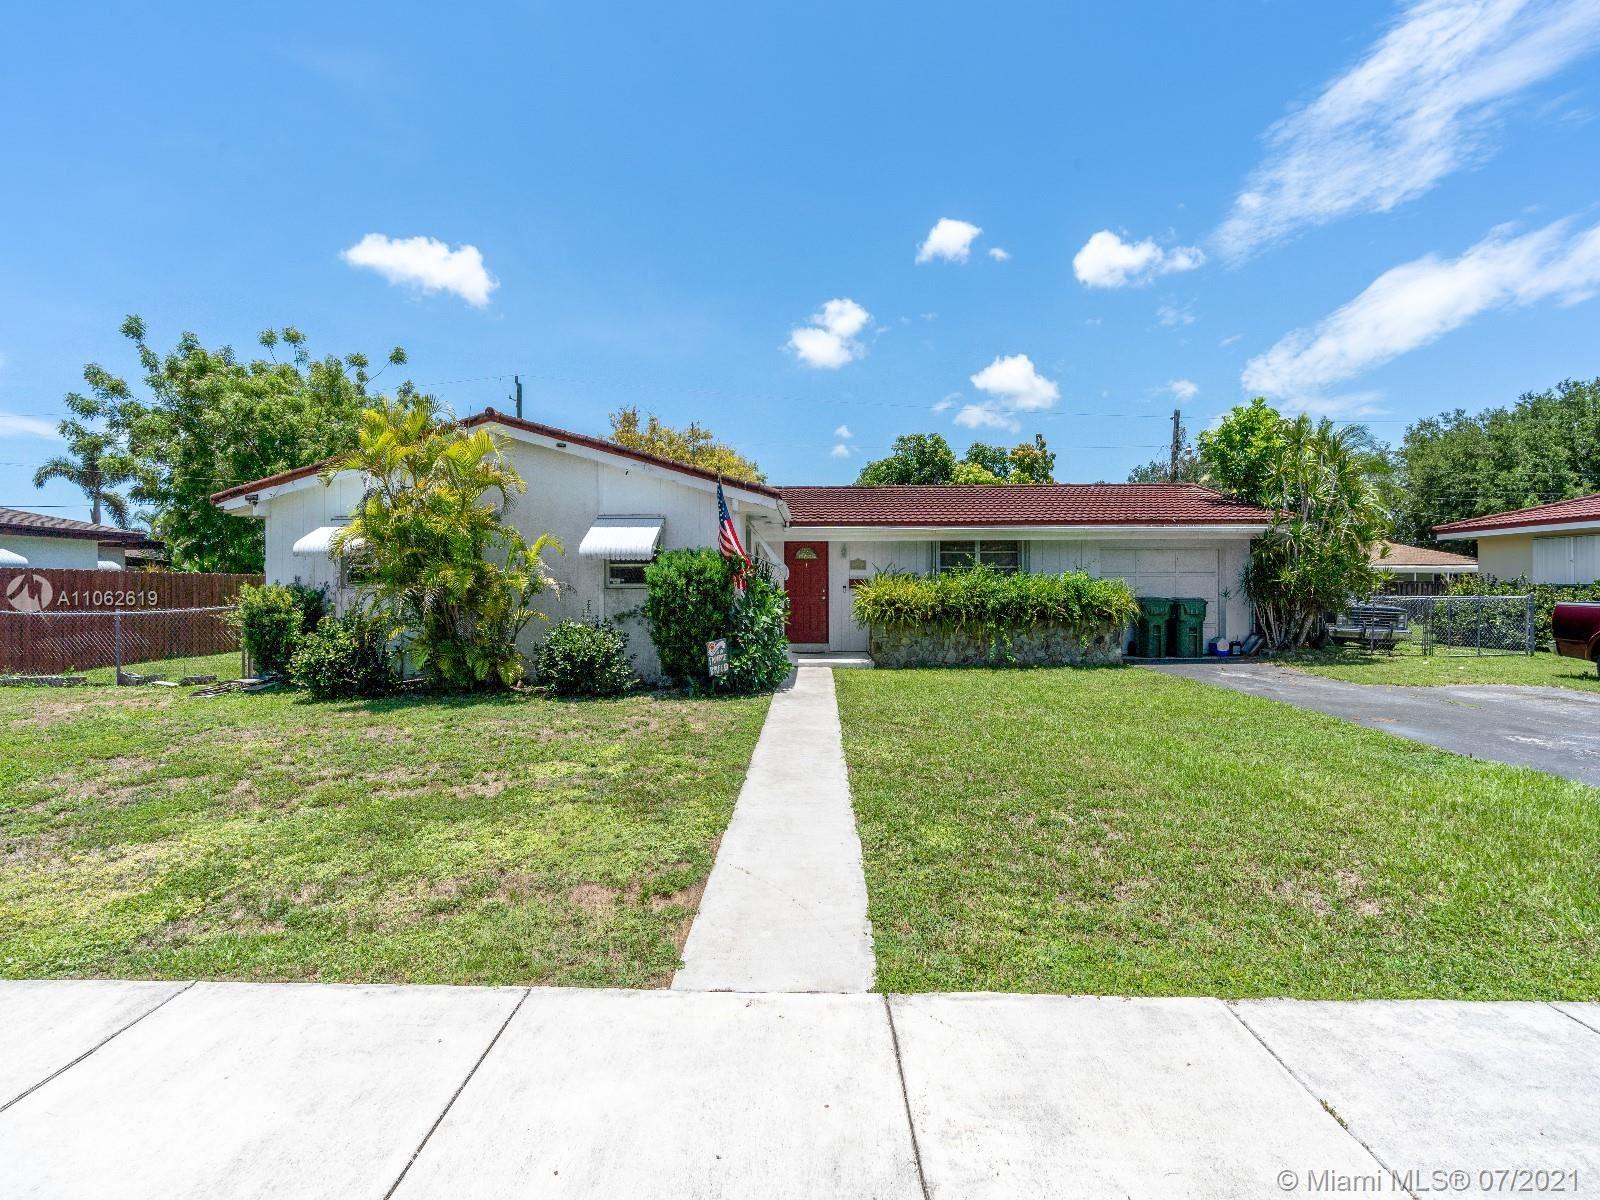 324 NW 19th St, Homestead, FL 33030 - #: A11062619